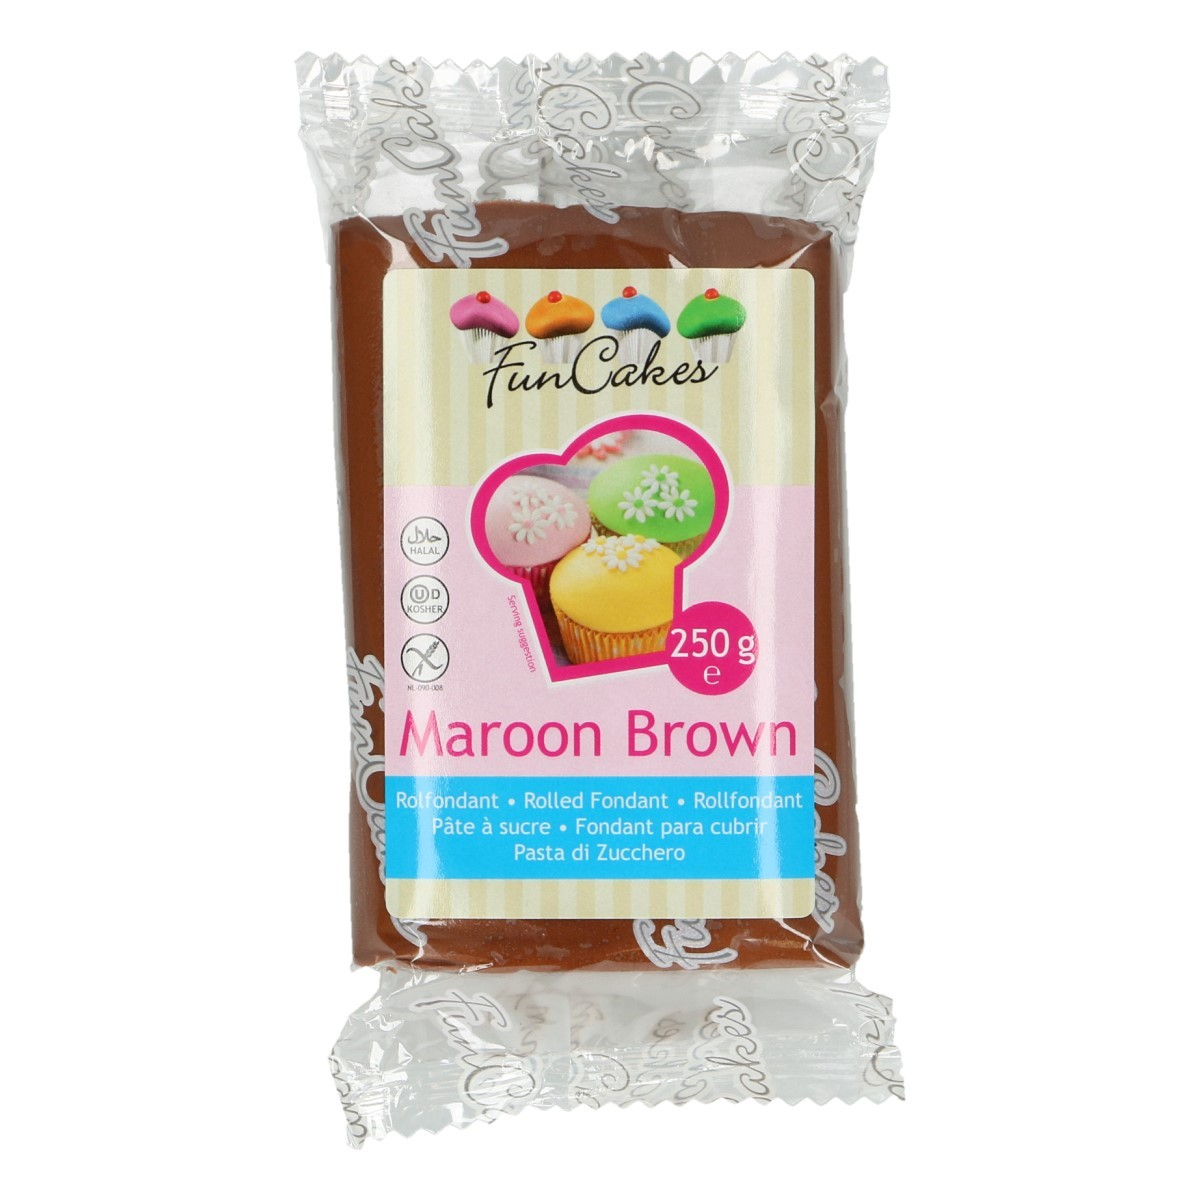 Roll fondant Maroon Brown hnedý 250 g